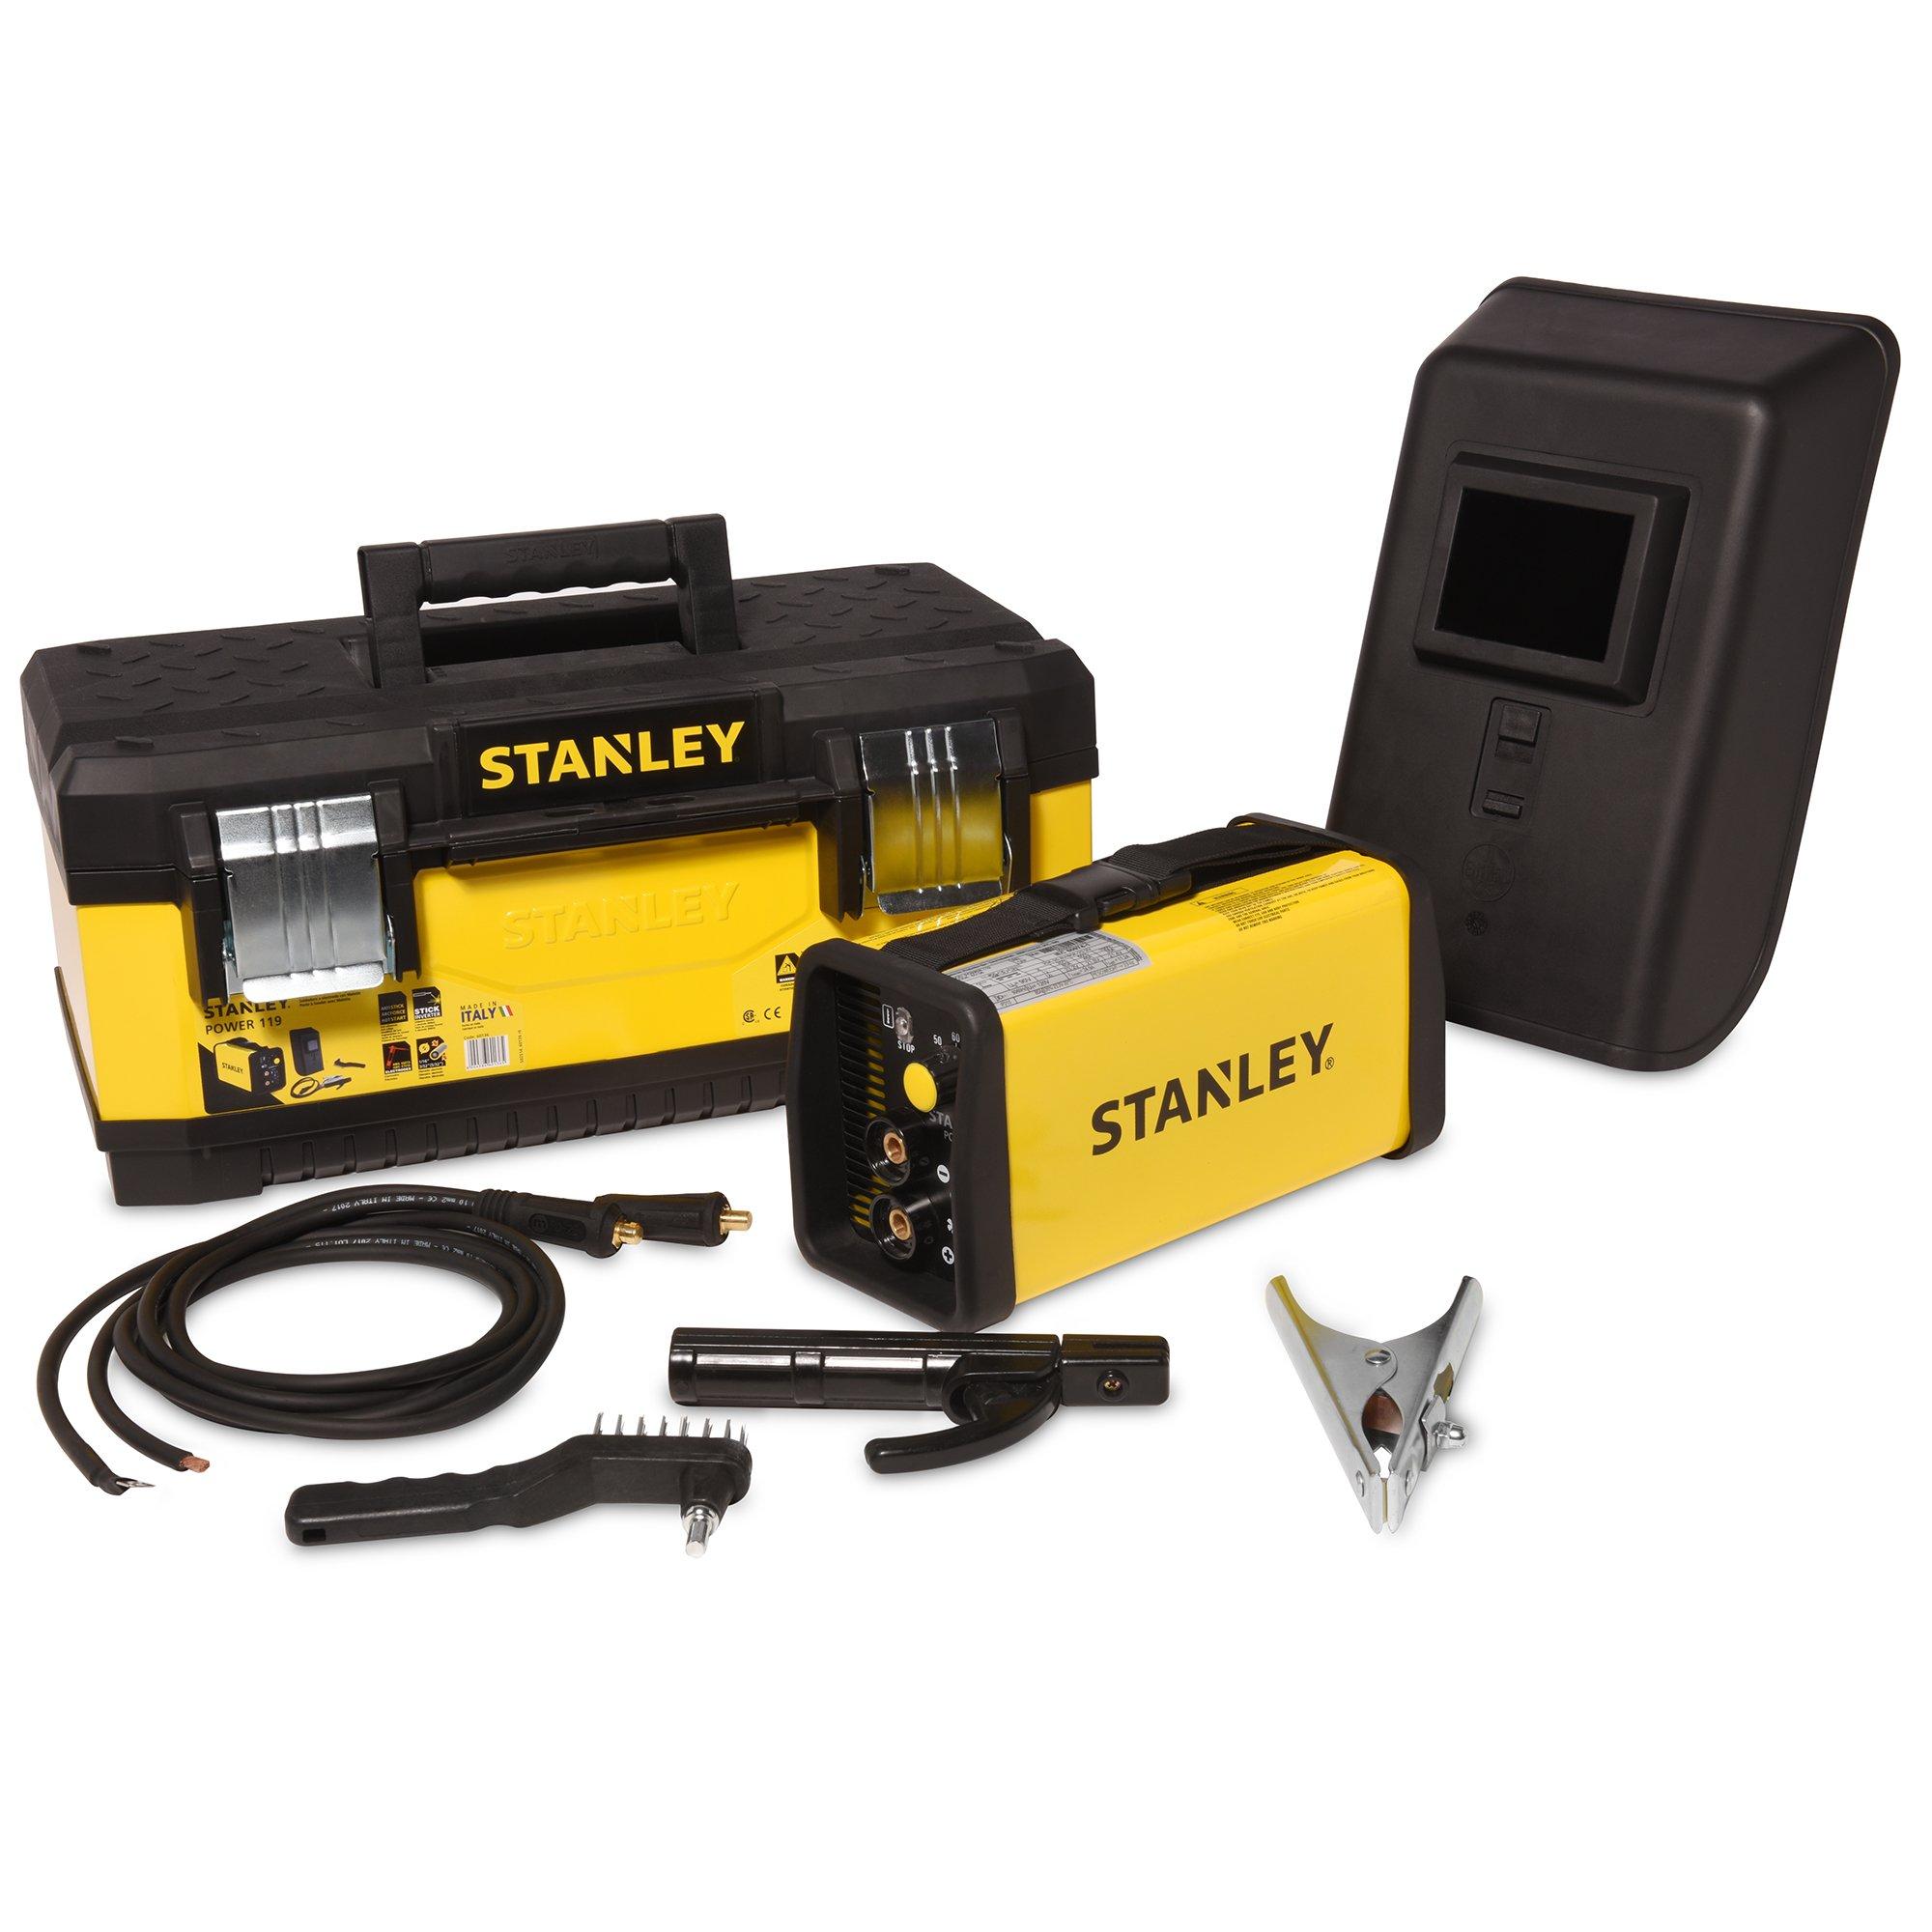 "Stanley Power 119 Inverter Stick Welder – Ultra Compact 120-Volt, 80-Amp Welding Machine for Mild and Stainless Steel – 13.7"" x 4.9"" x 6.1"""